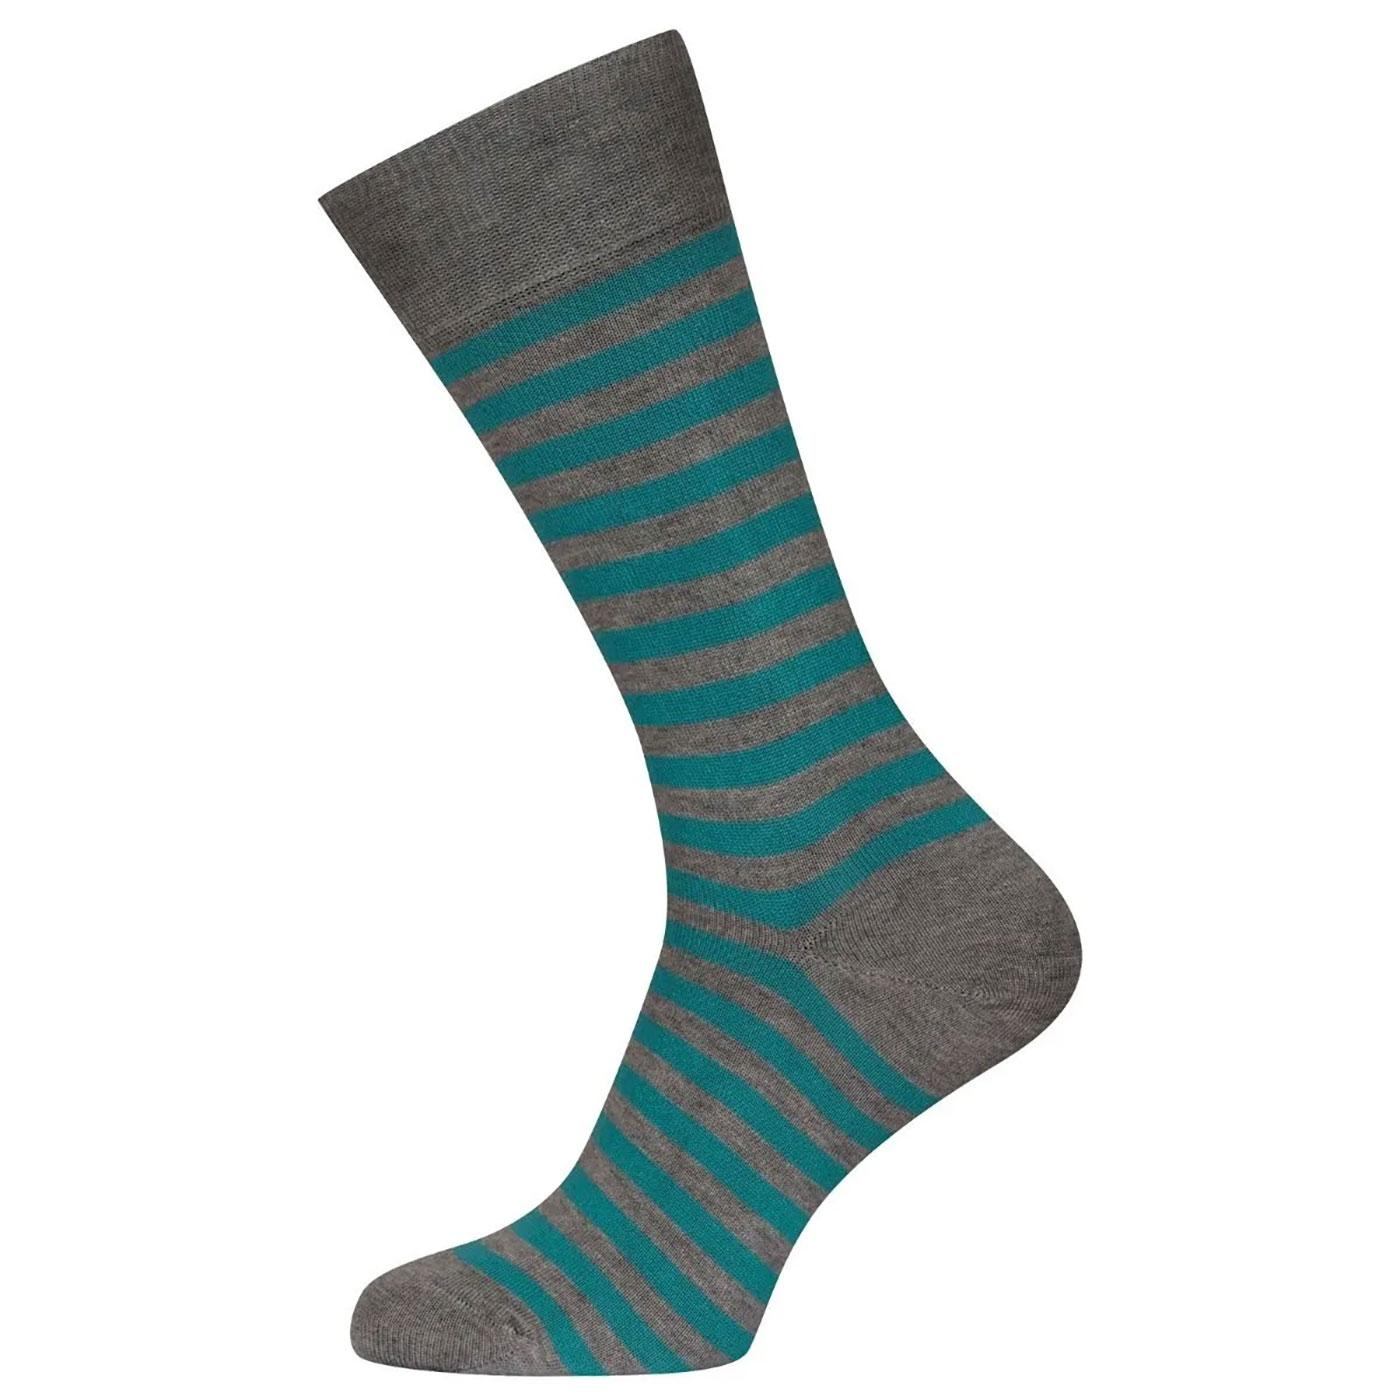 + Hecate JOHN SMEDLEY Men's Striped Cotton Socks C